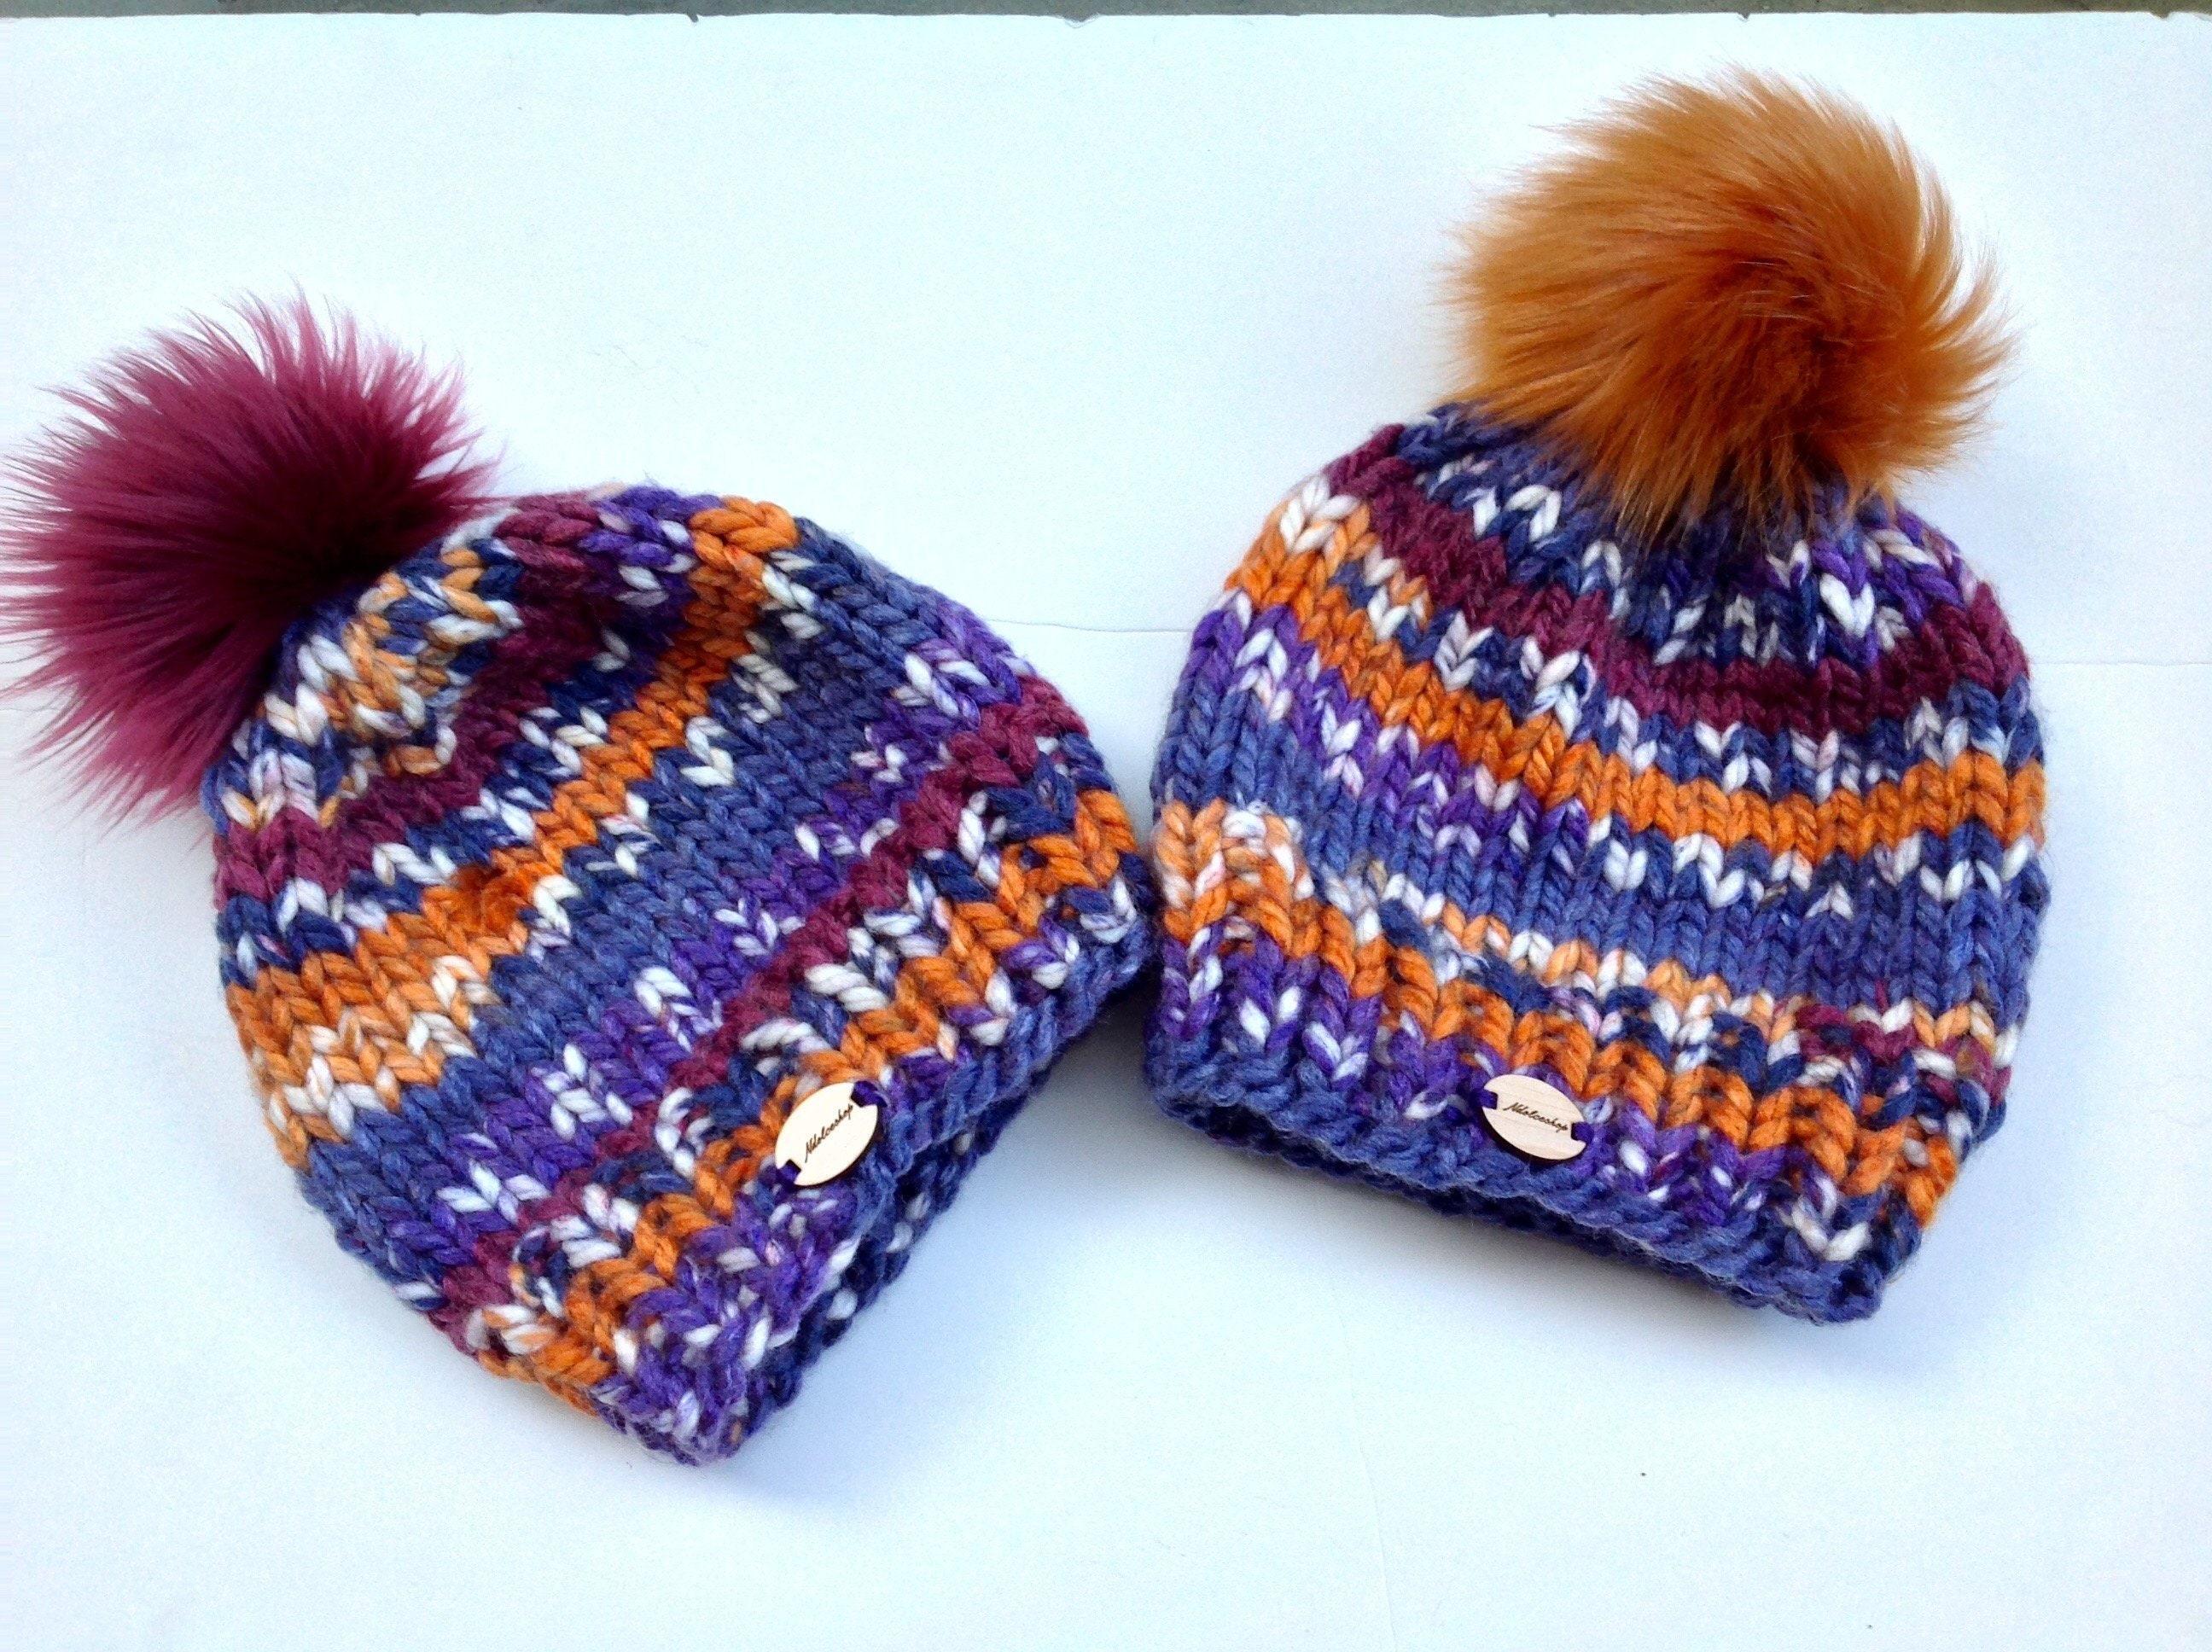 Chunky knit hat faux fur Pom Pom knitted beanies winter  b3d8fe1a03ec